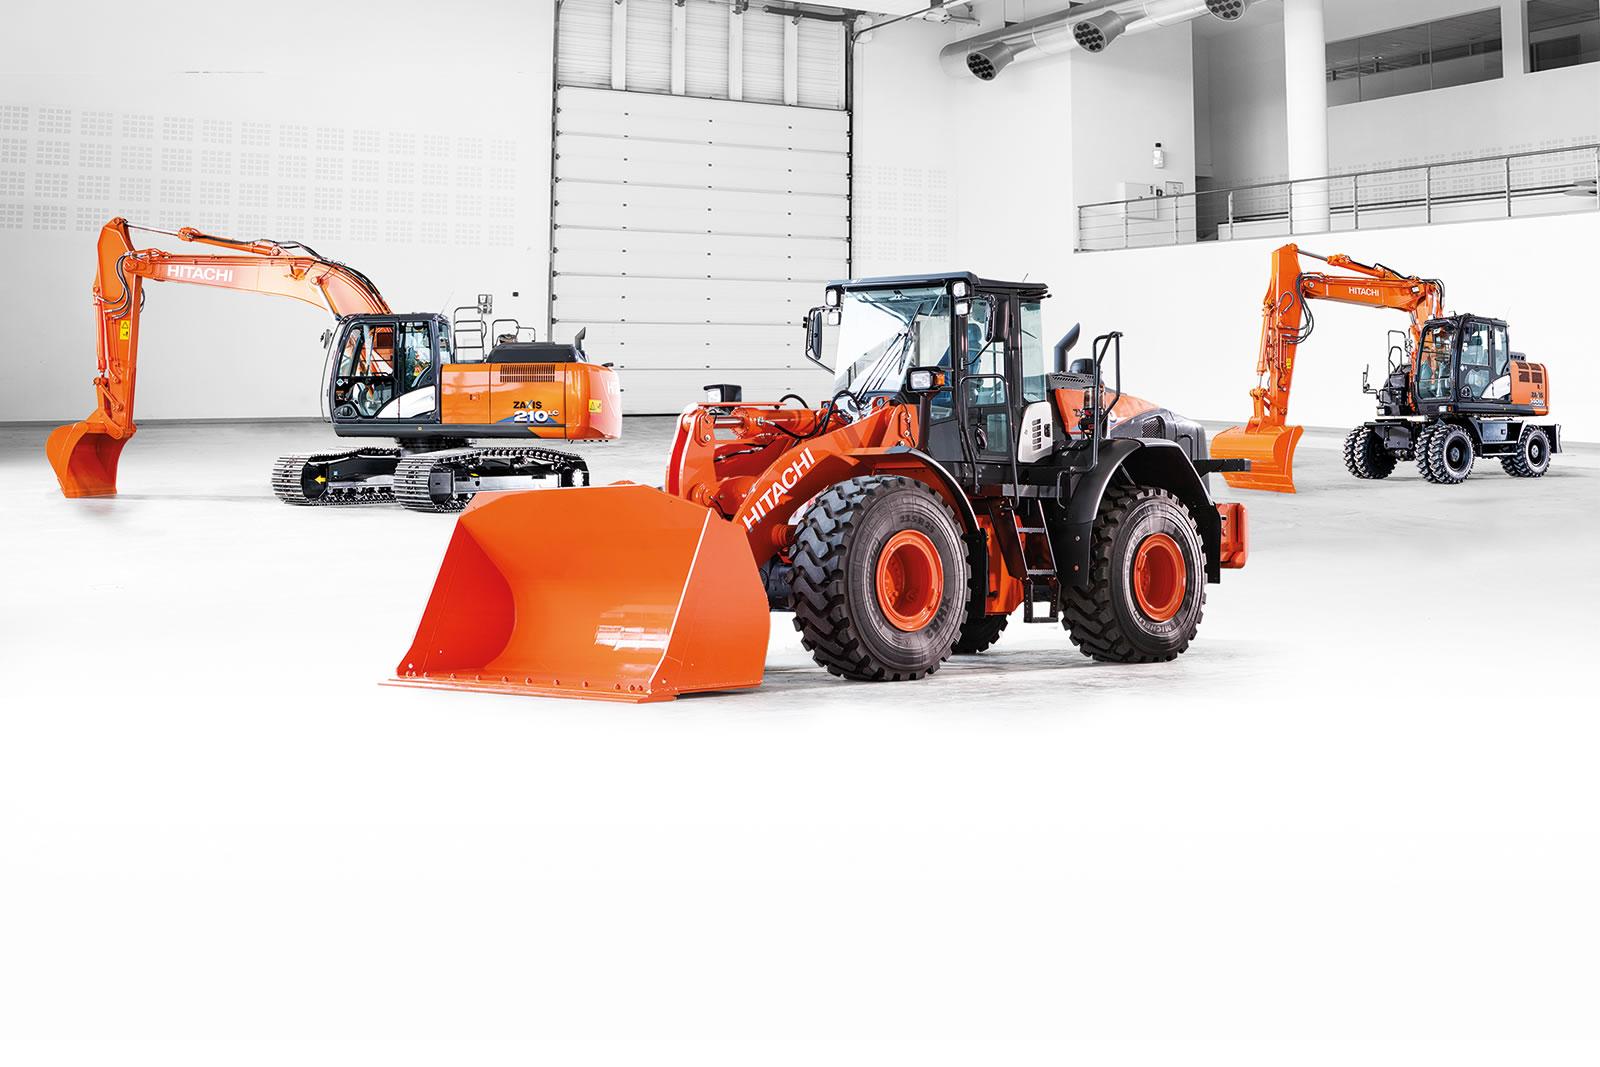 Hitachi dash-6 excavator, wheel loader and wheeled excavator